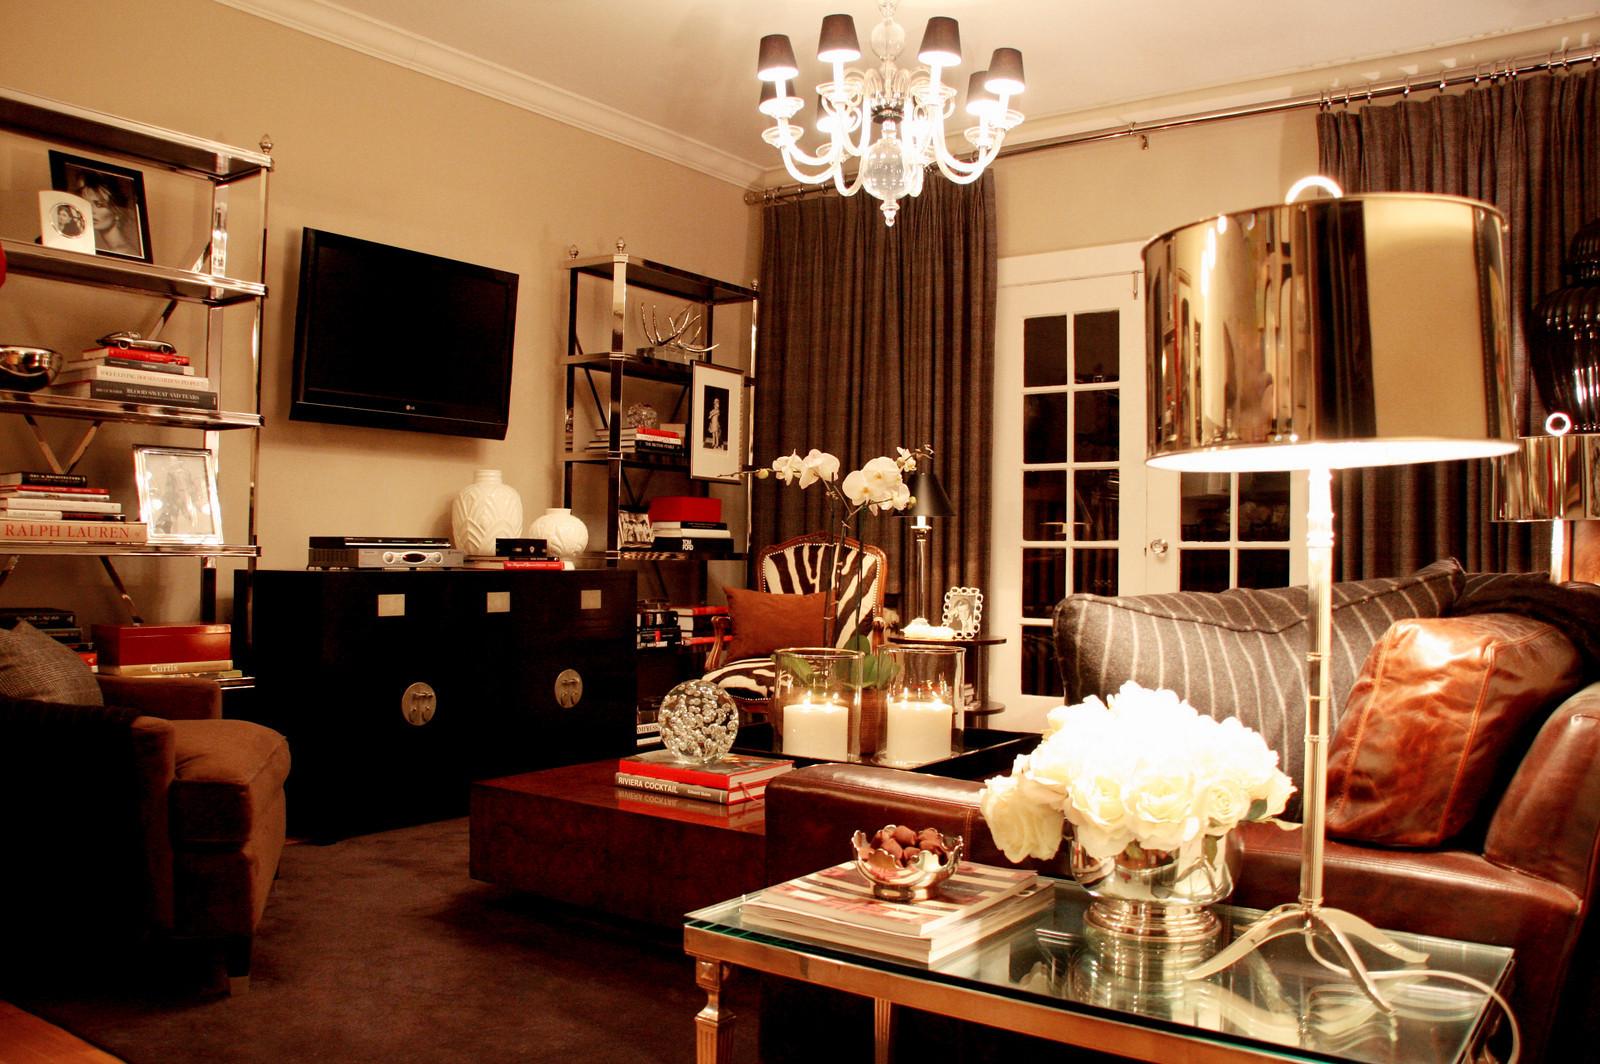 Scot Meacham Wood Design - Presidio Heights Living Room 3.jpg